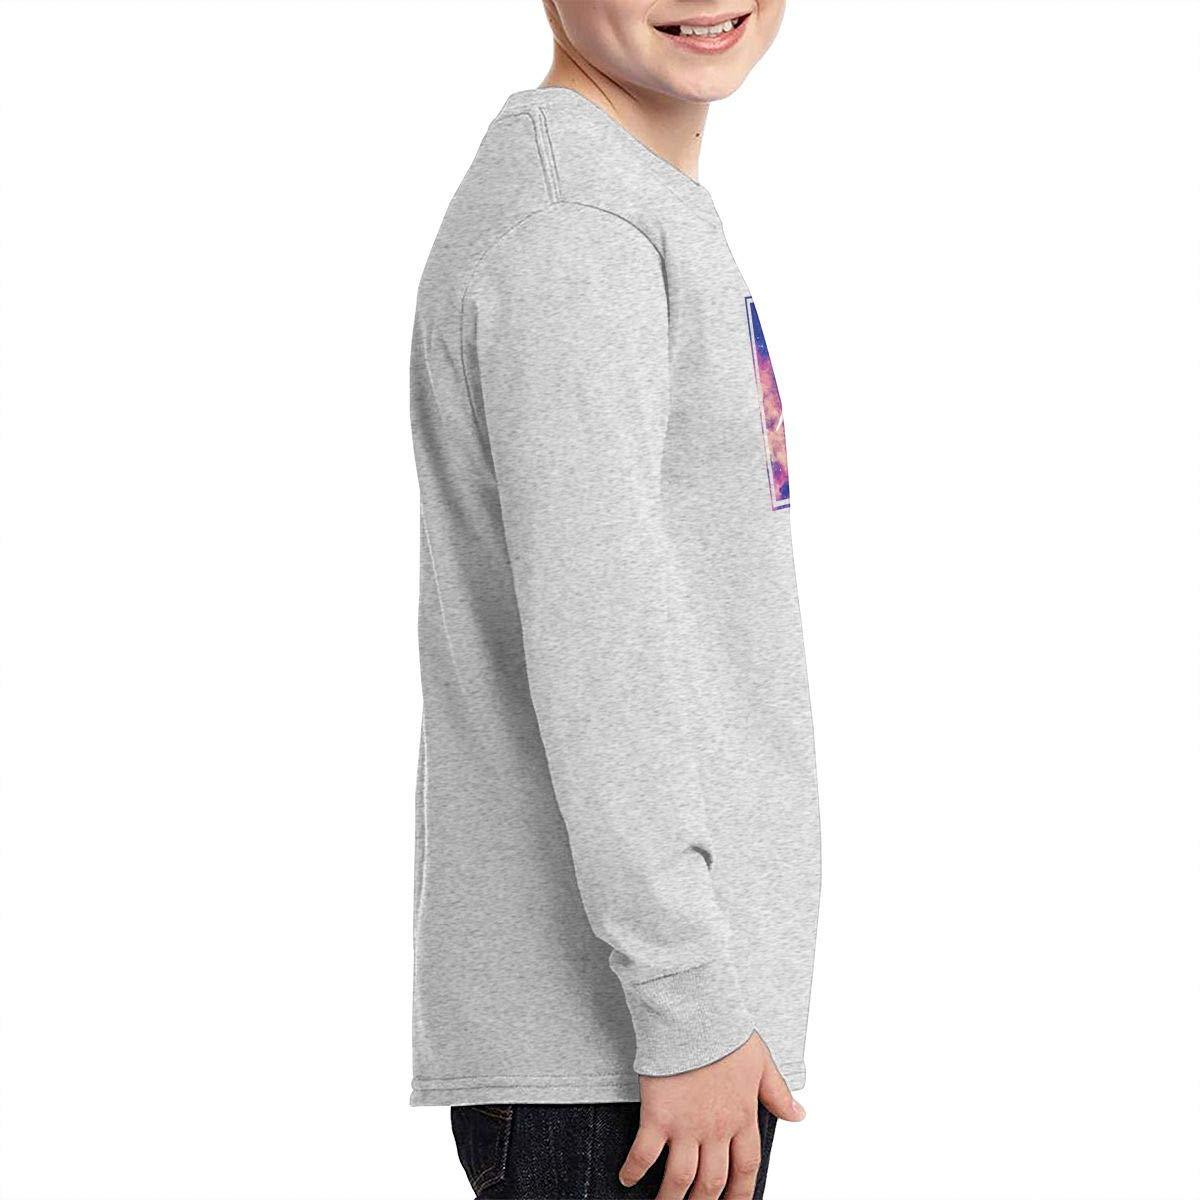 Vnmwertpl Panic at The Disco Long Sleeve Teen Boys Girls Teenage Sweatshirts